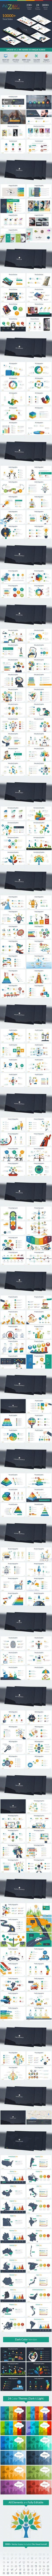 Mazano - Multipurpose Google Slides Template